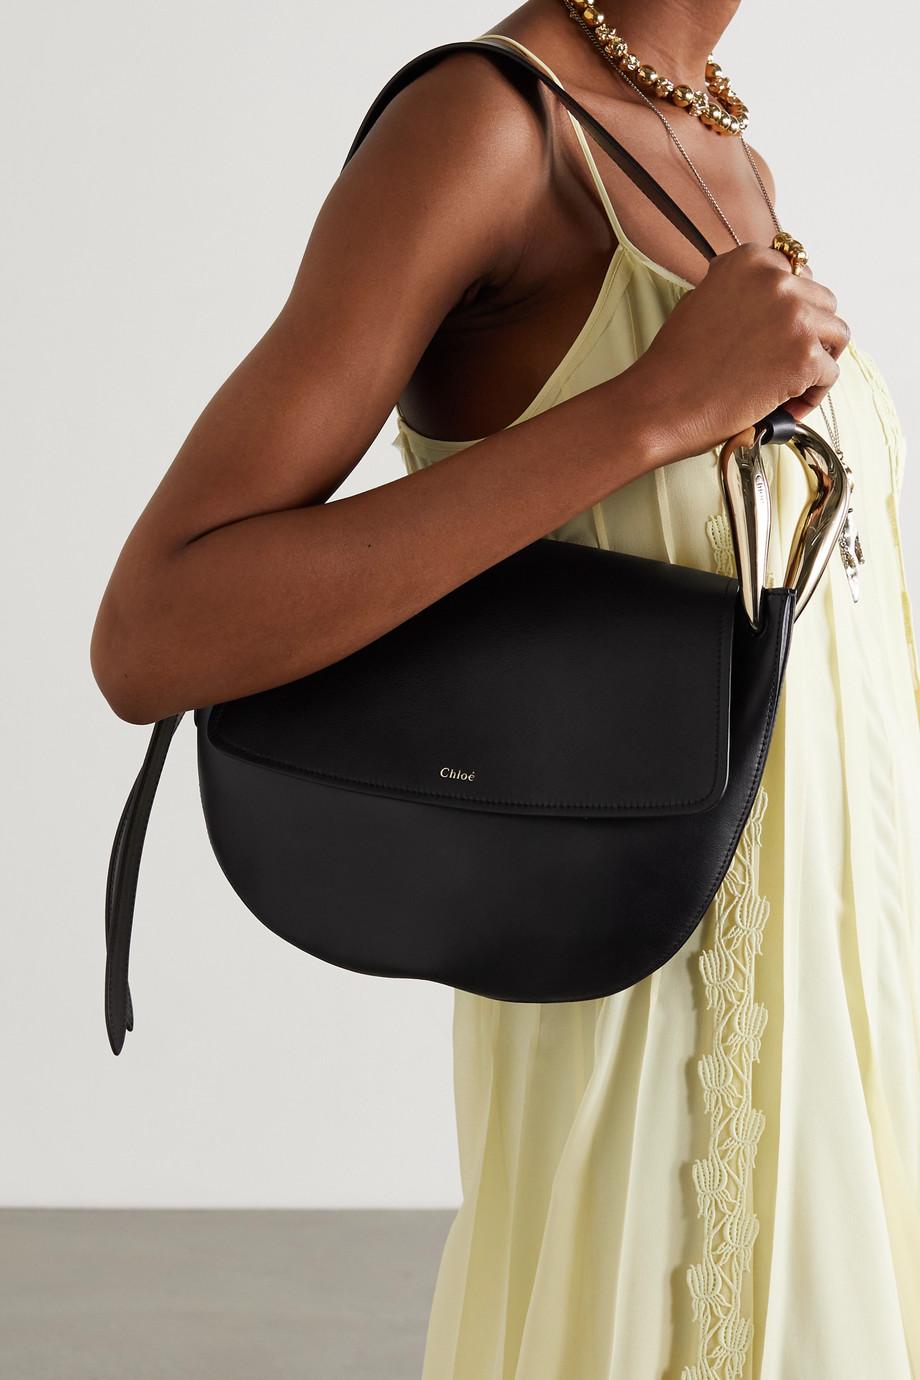 Chloé Kiss small leather shoulder bag